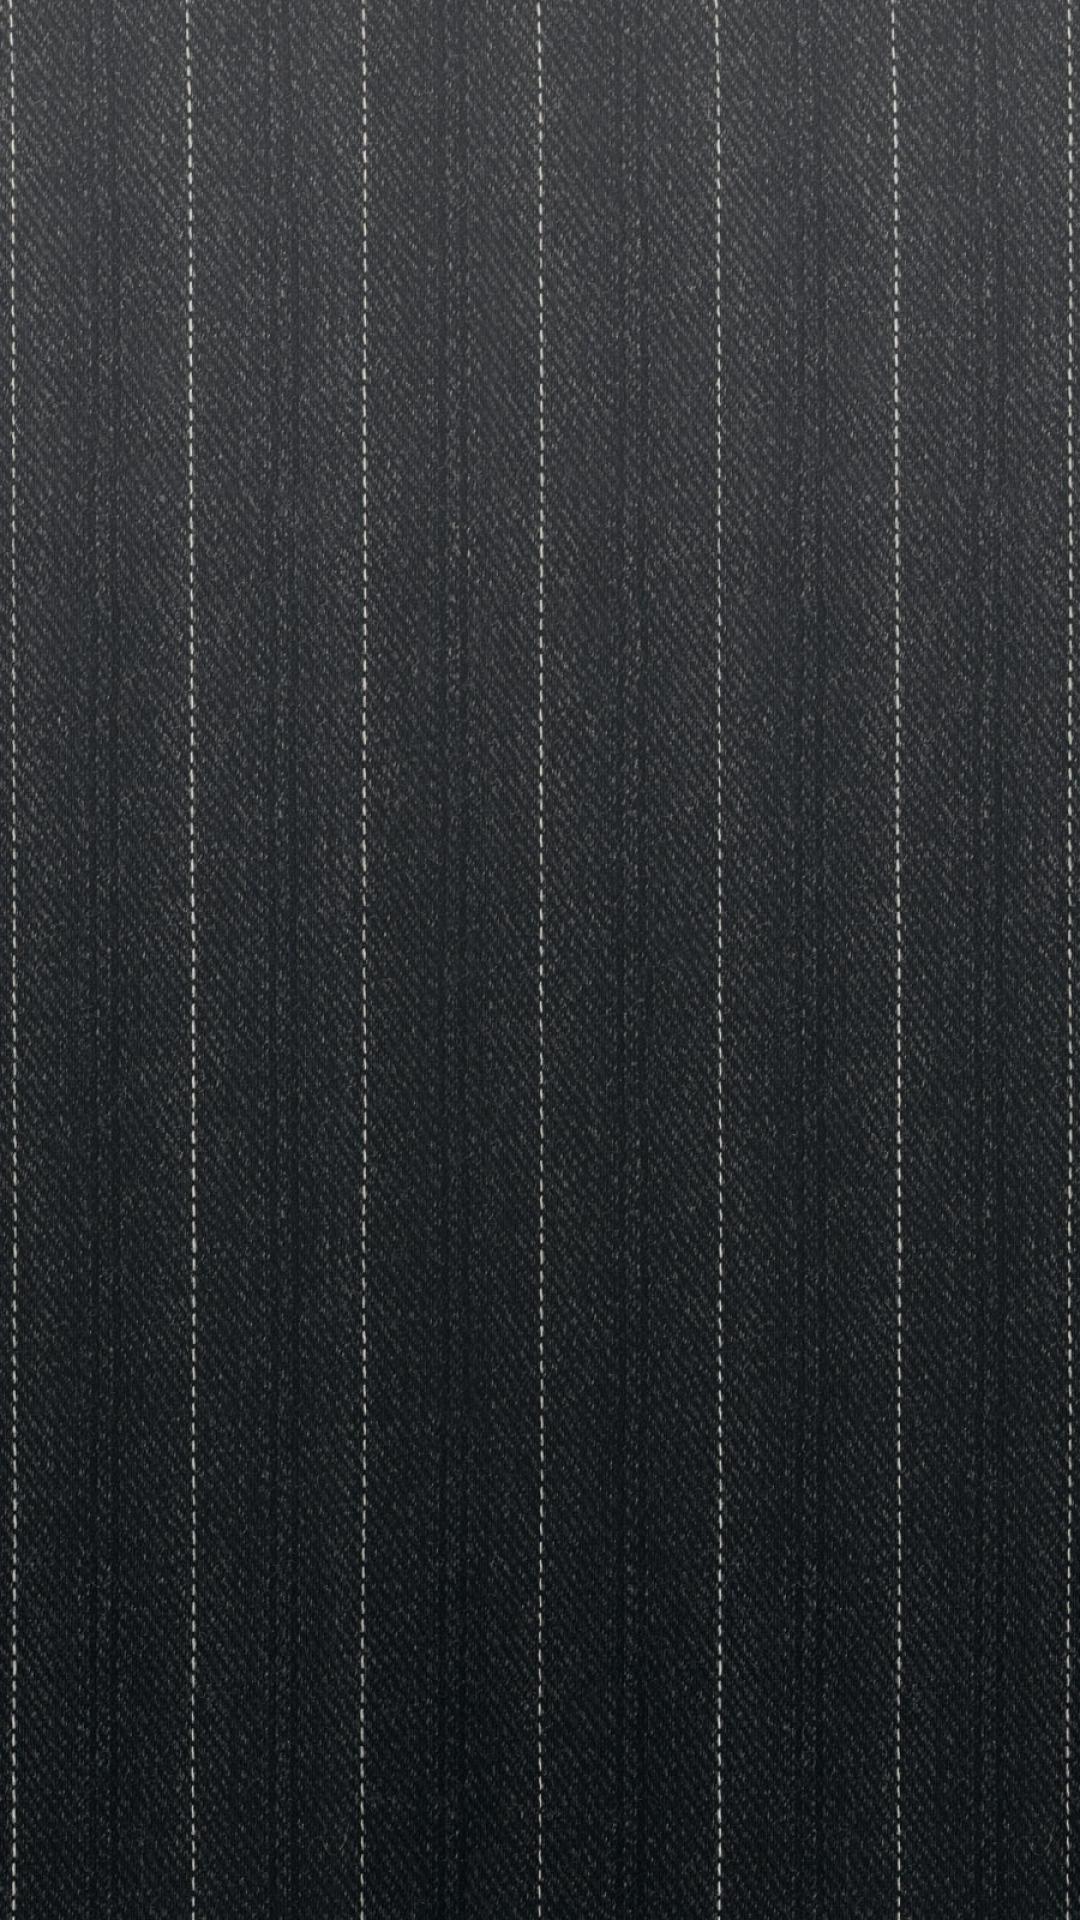 Download Wallpaper 1080x1920 stripes, cloth, gray, vertical, lines ...